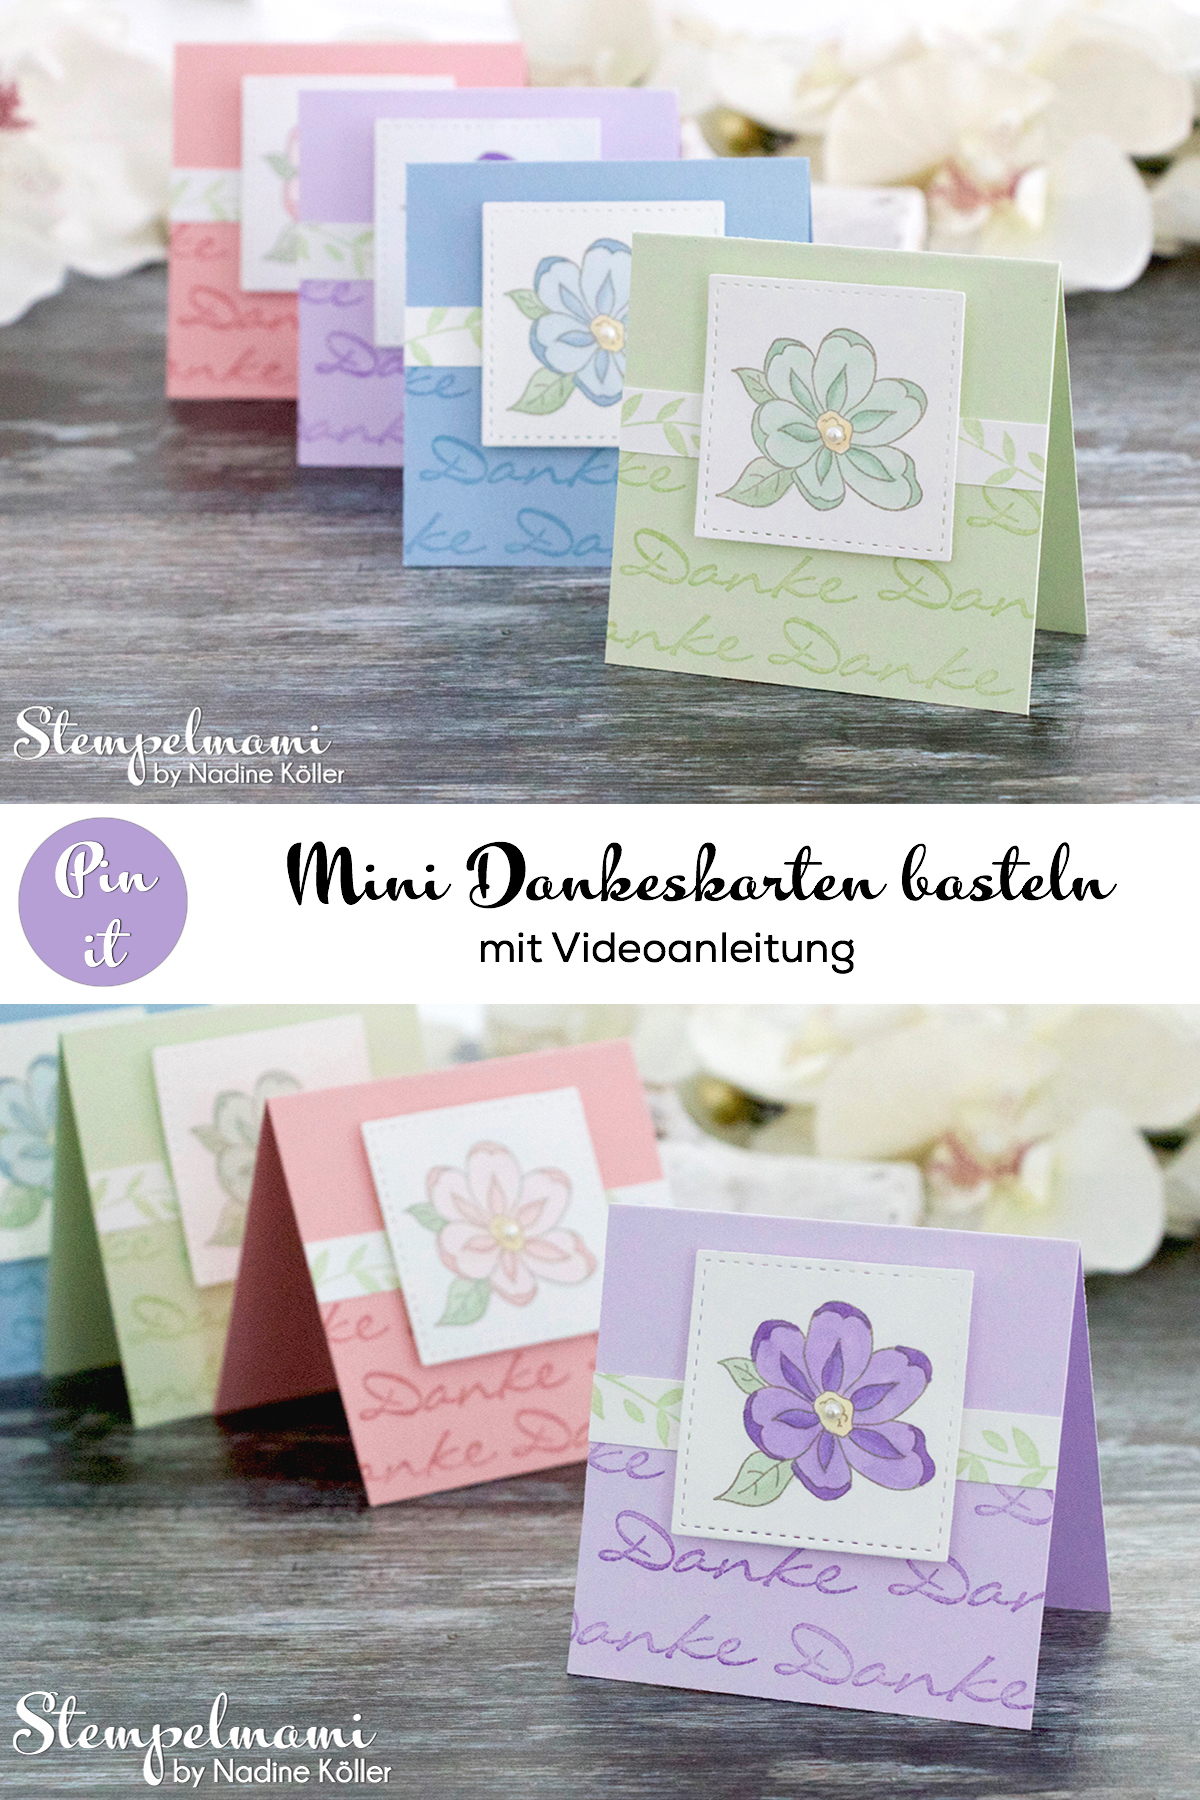 Stampin Up Anleitung Tutorial Mini Dankeskarten basteln Gartenzauber Stampin Blends Videoanleitung Youtube Stempelmami Pinterest